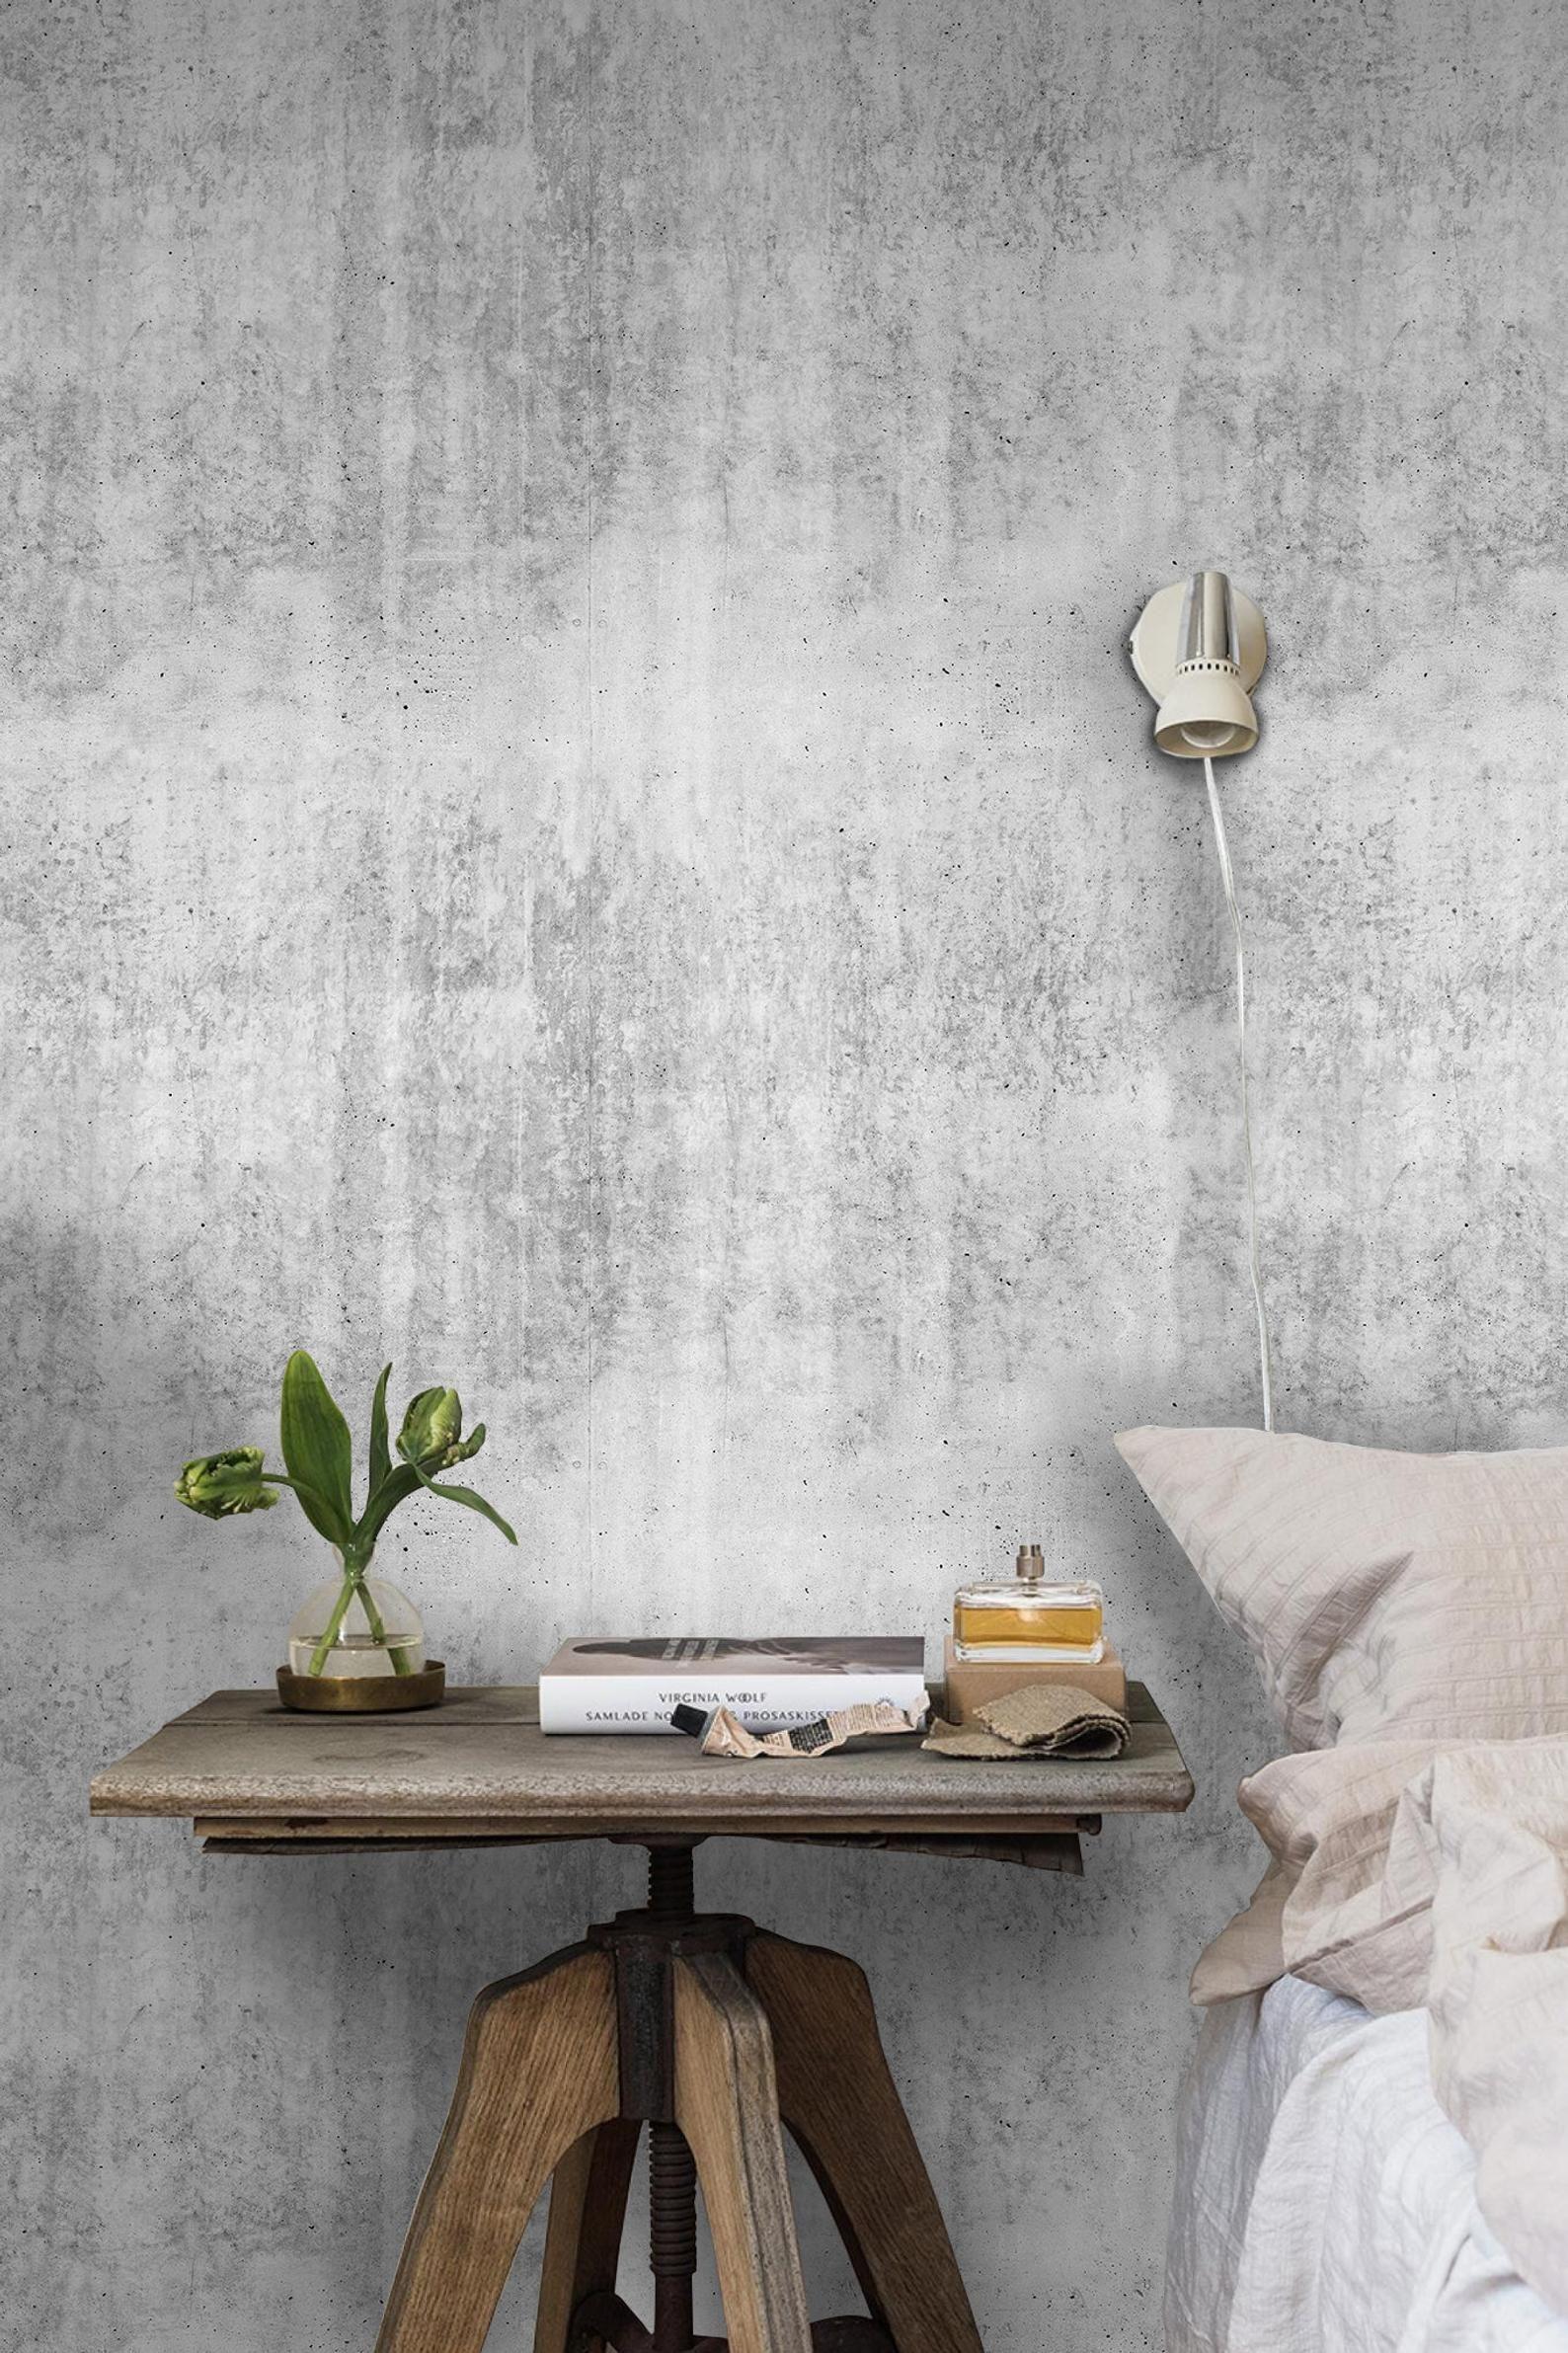 Gray Concrete Wall Removable Wallpaper Gray Wall Mural Non Etsy Concrete Wall Grey Walls Removable Wallpaper